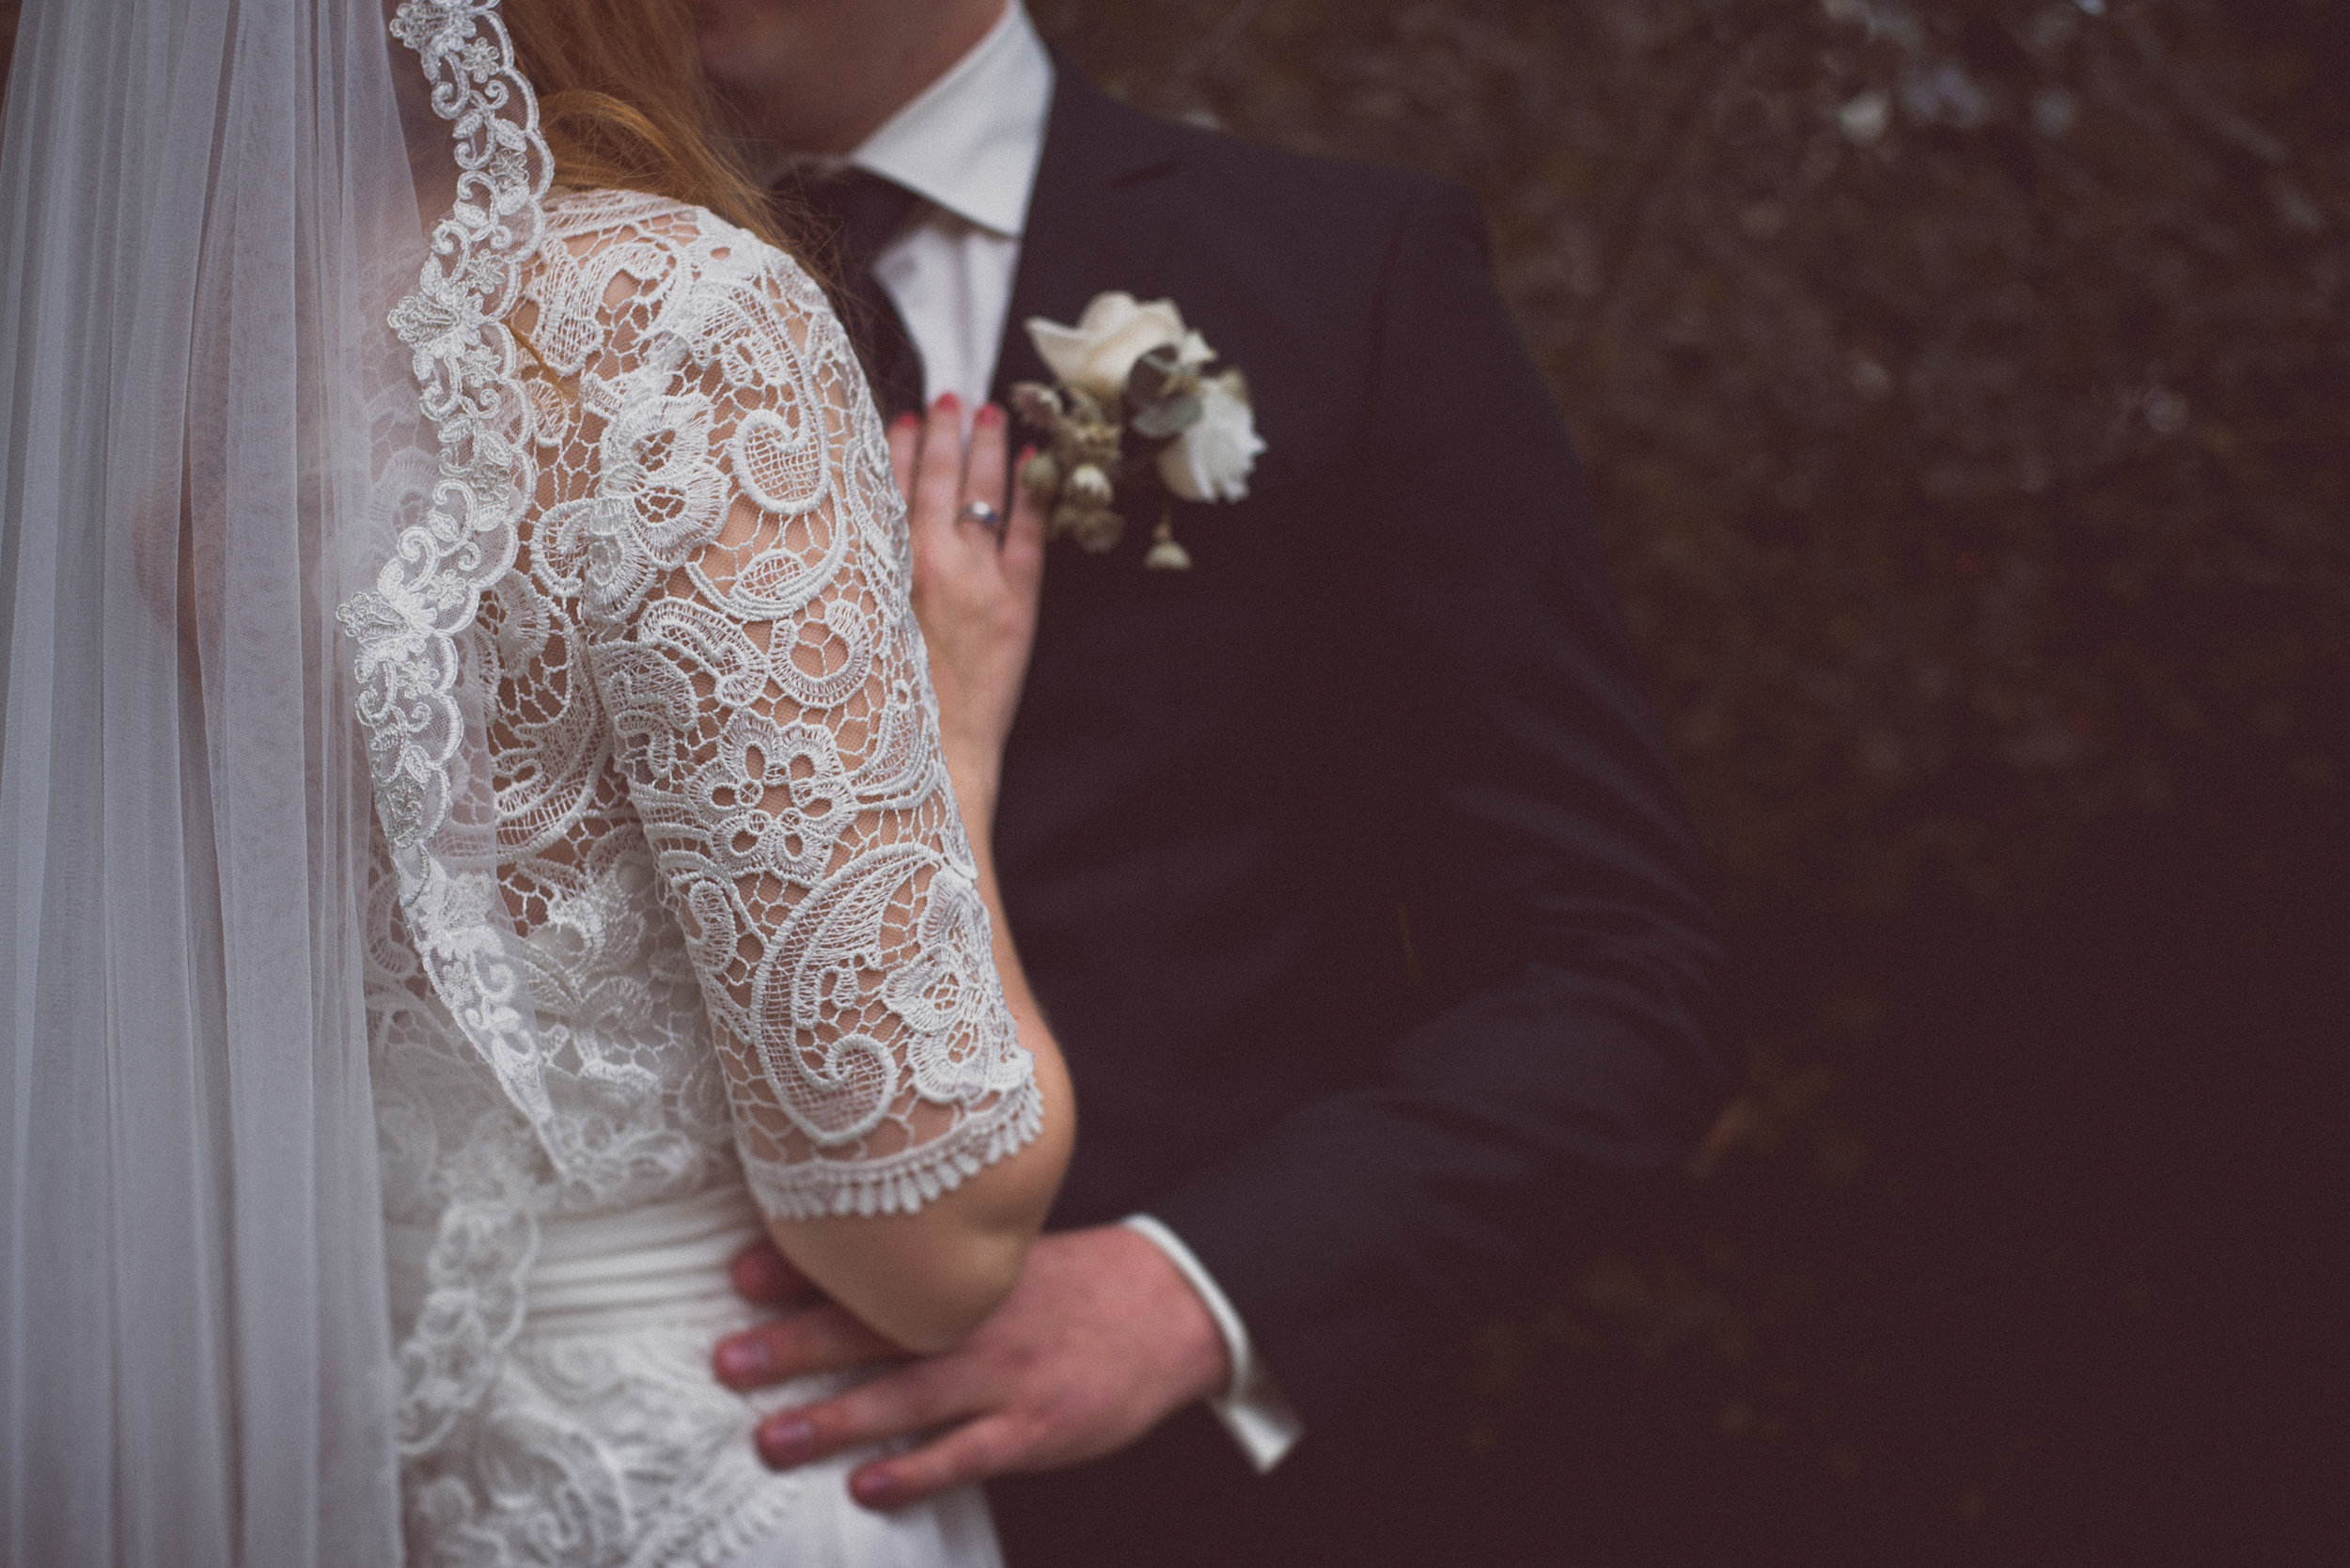 York Region Ontario Wedding Photographer - Bride + Groom-7-2.jpg